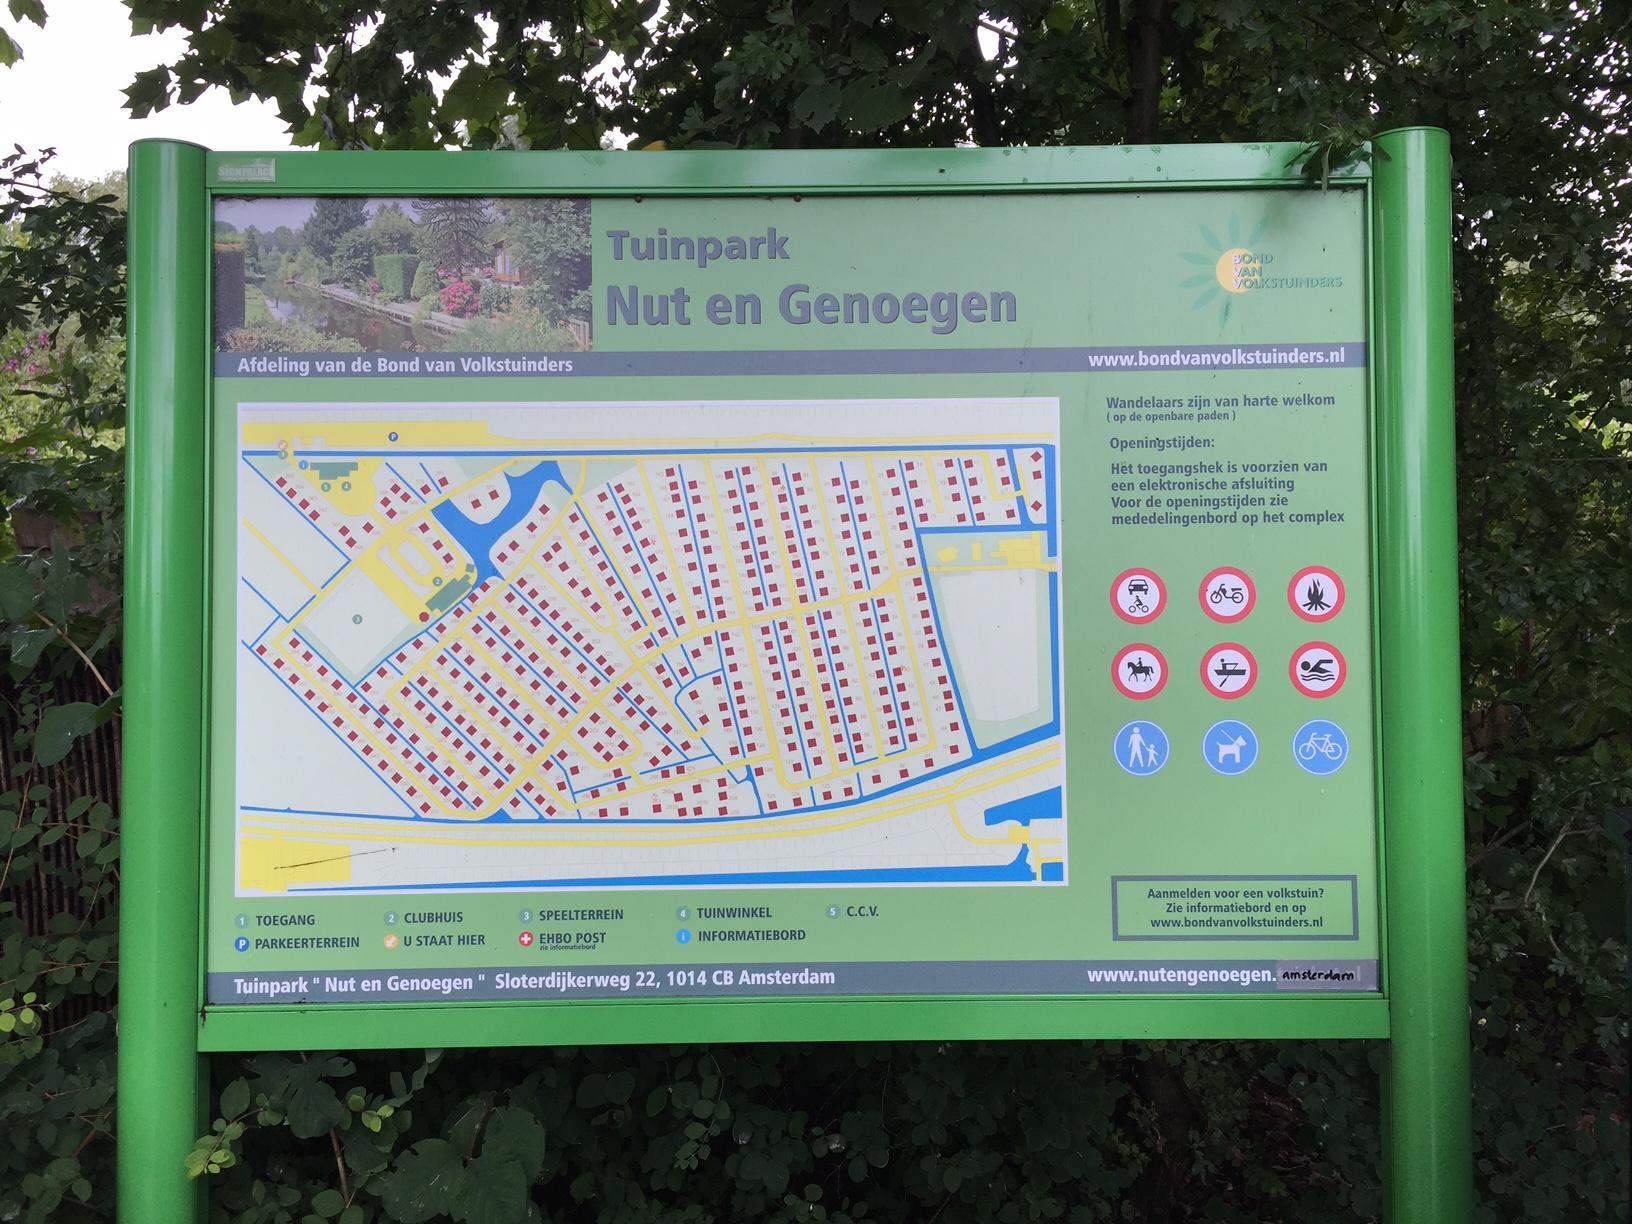 Tuinpark Nut en Genoegen